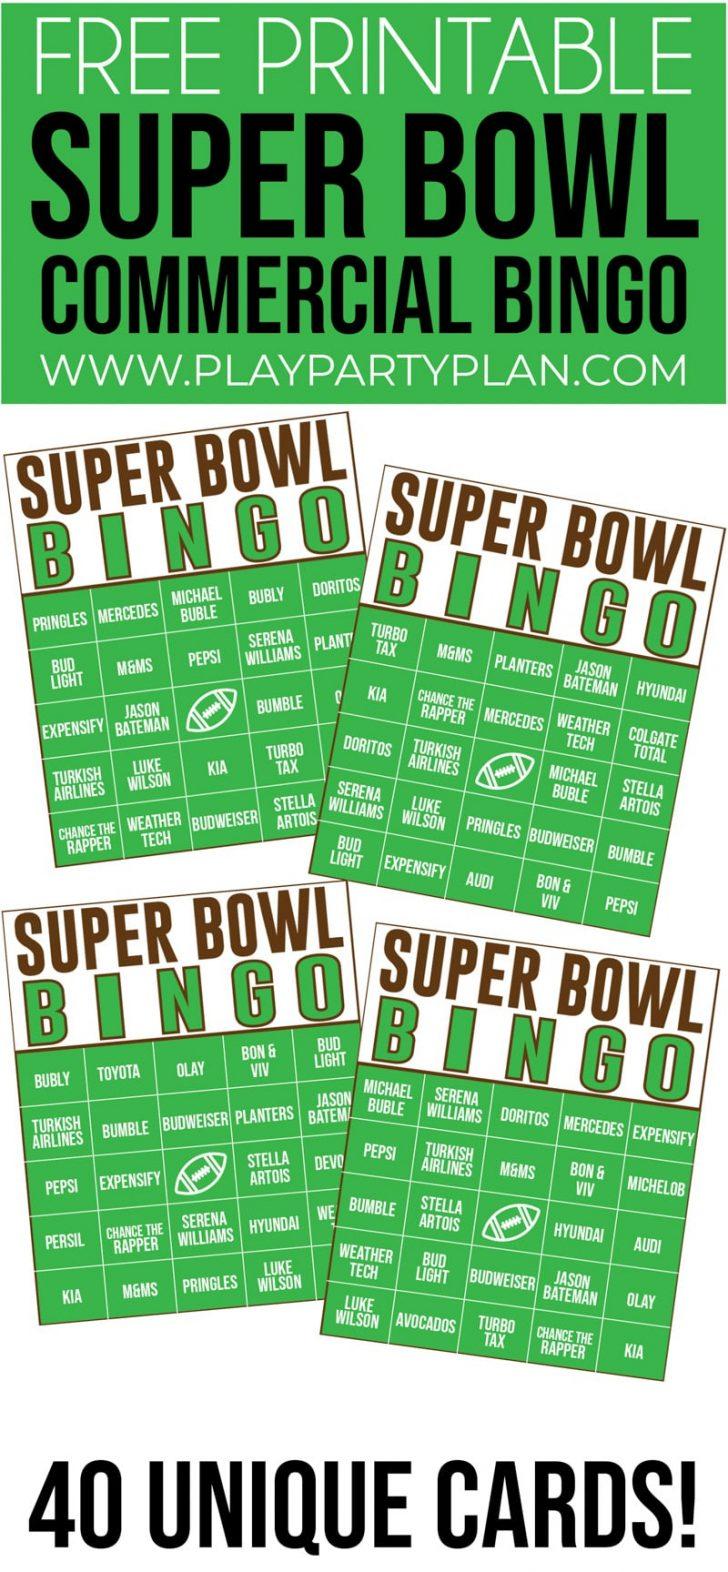 Free Printable Super Bowl Commercial Bingo Cards